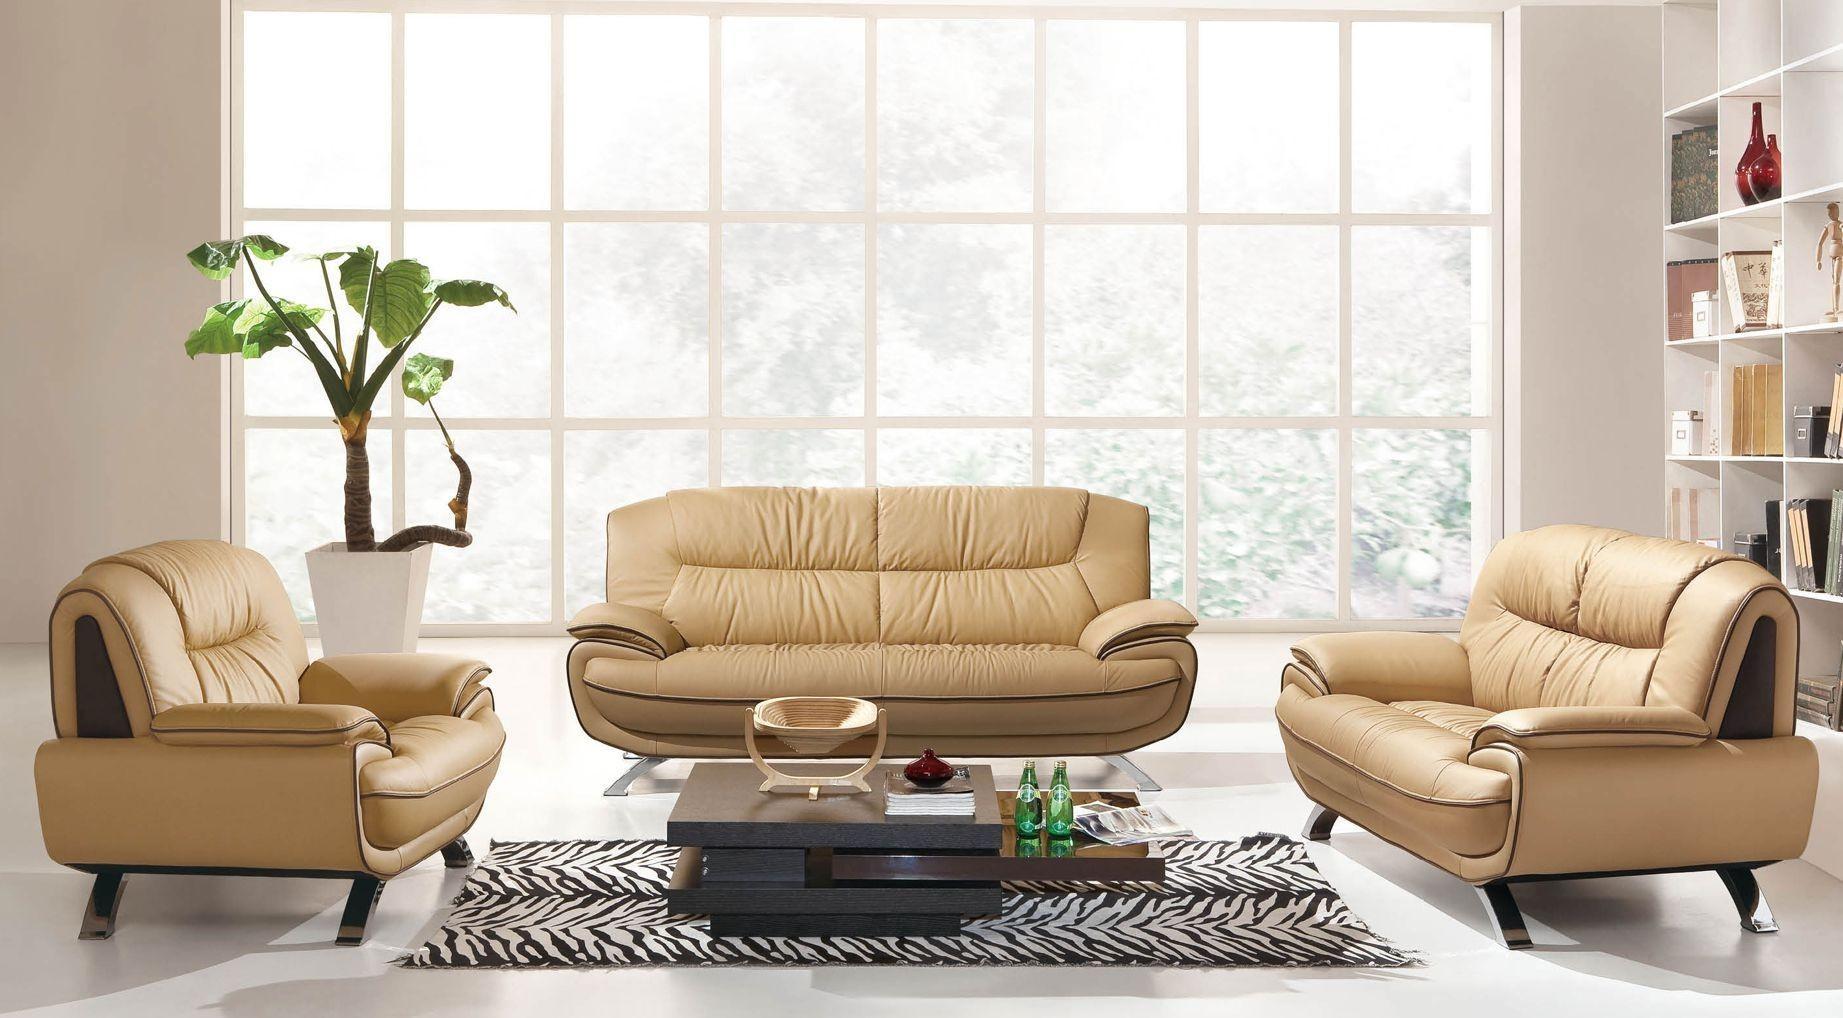 Sofa Set For Living Room Living Room Design And Living Room Ideas Throughout Living Room Sofa And Chair Sets (Image 19 of 20)